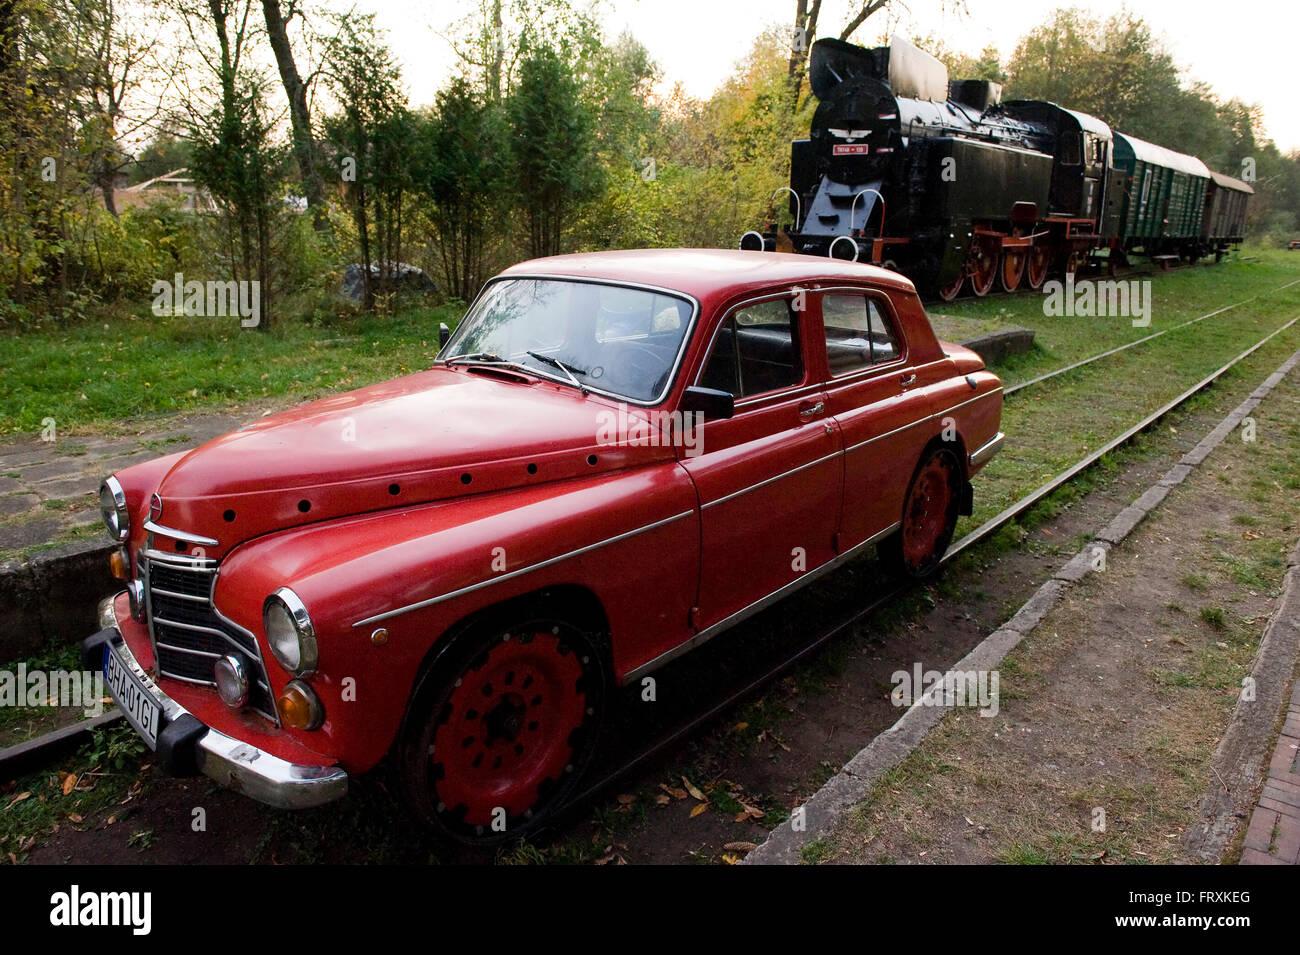 Car and steam locomotive, Bialowieza National Park, Podlaskie Voivodeship, Poland - Stock Image